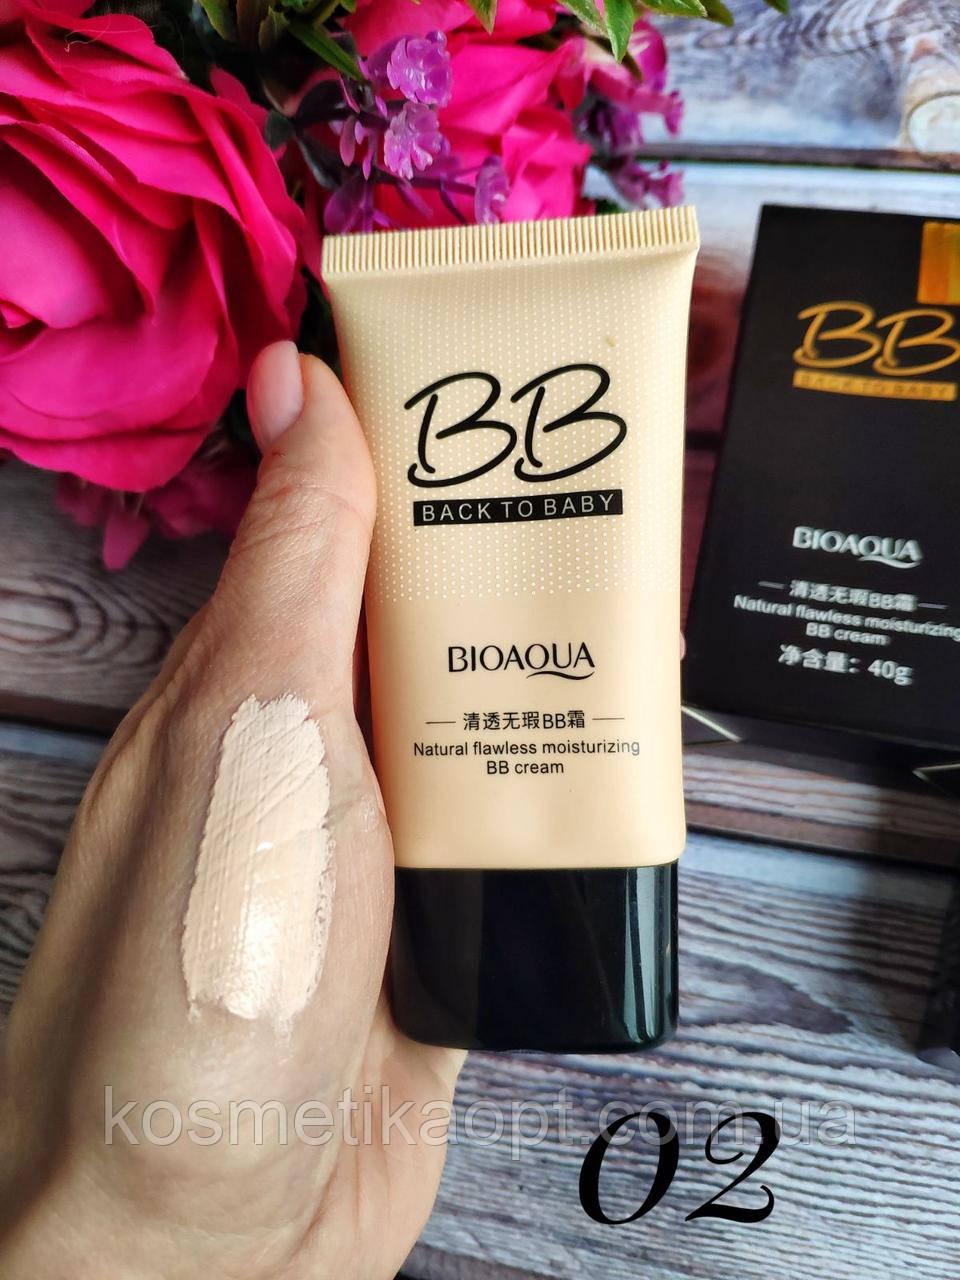 BioAqua Back to Baby BB Cream Увлажняющий BB крем, 40 грамм ТОН 02 Светлый беж